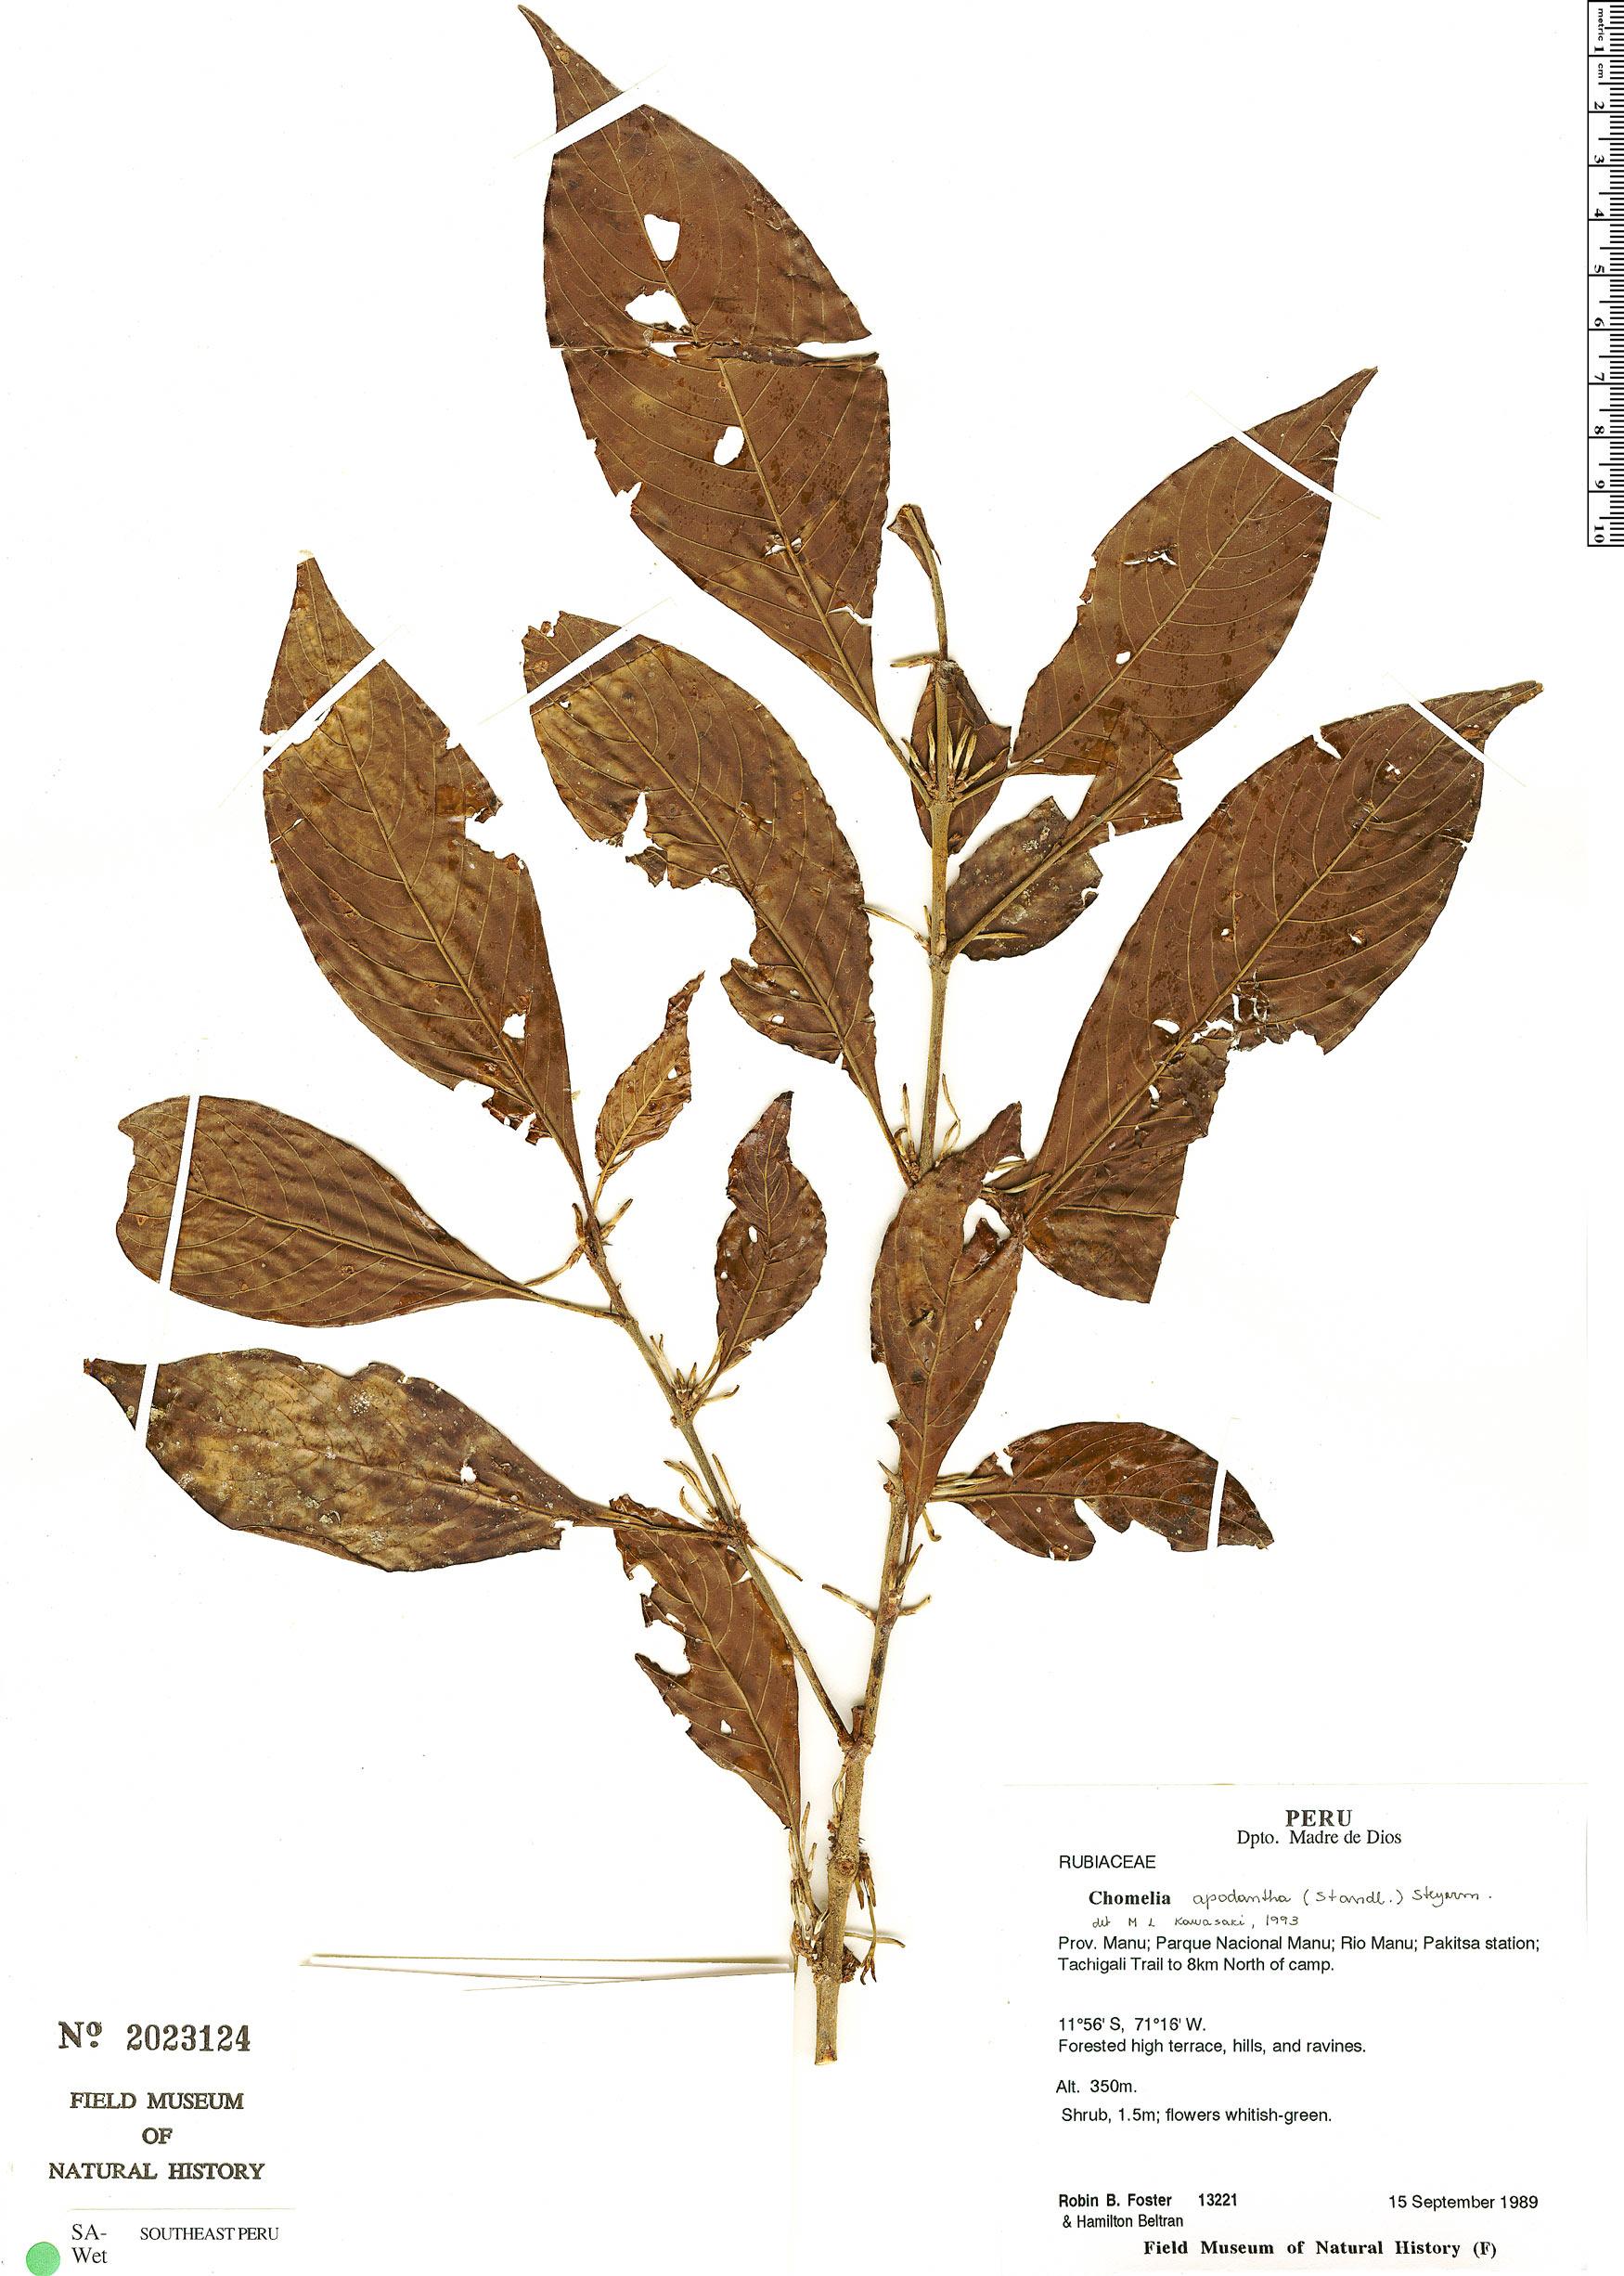 Specimen: Chomelia apodantha